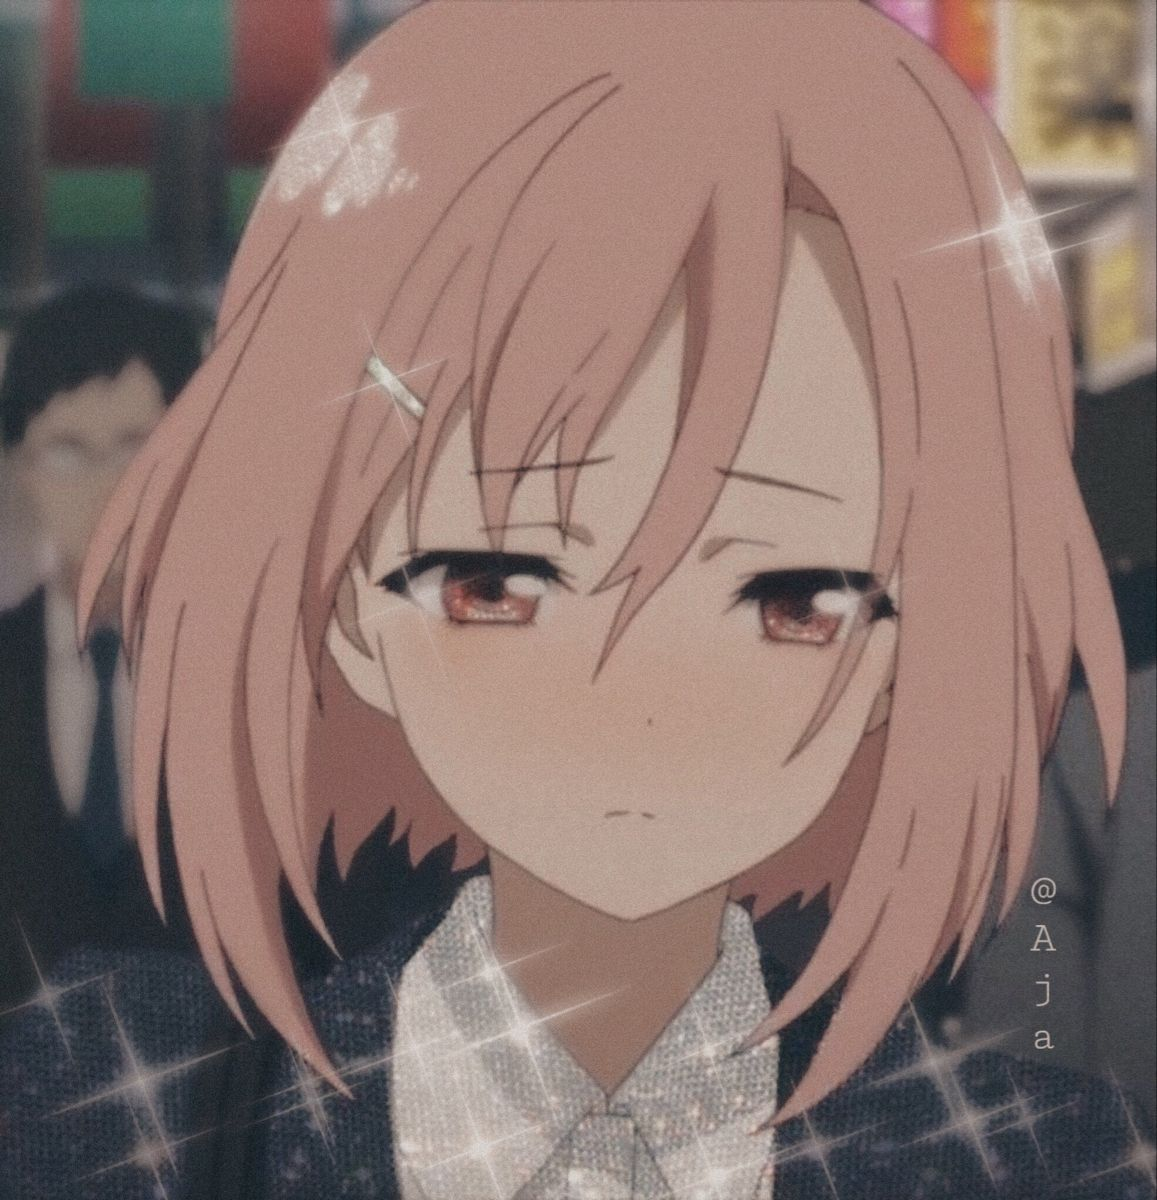 𝒜𝒿𝒶 🎀 *.° in 2020 Anime characters, Kawaii anime, Anime